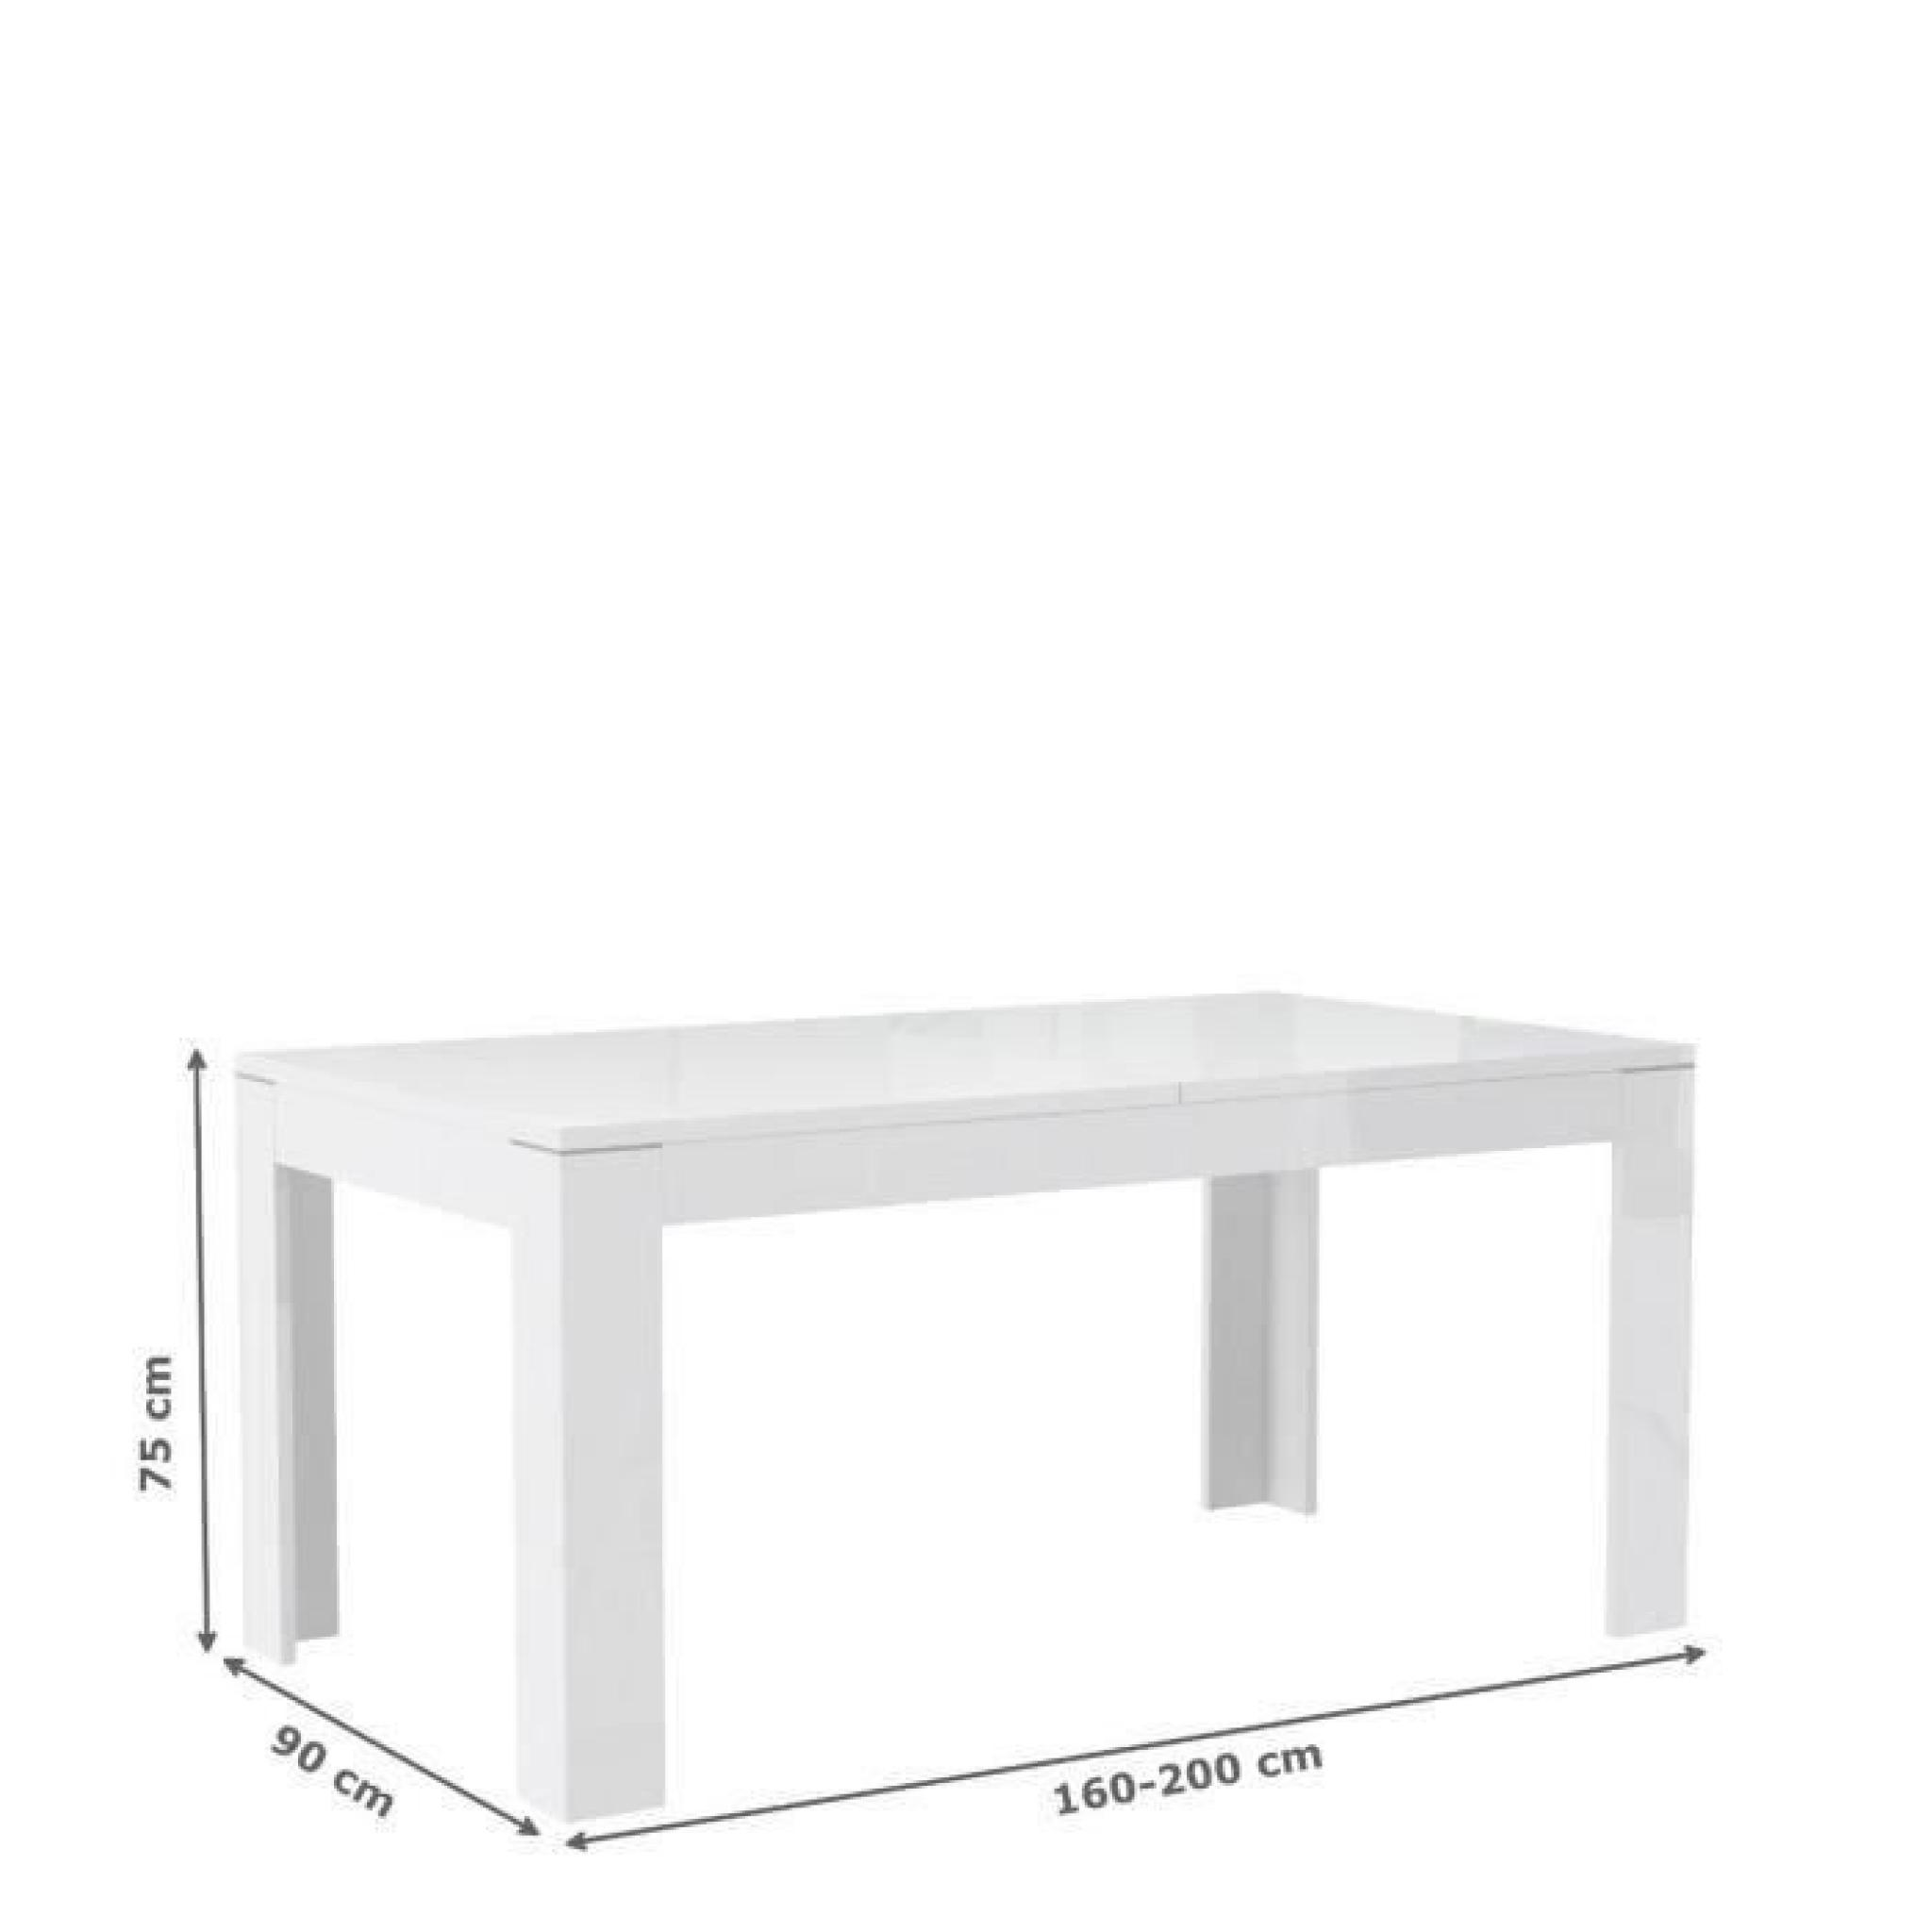 Finlandek Manger 160 207x75cm Table Extensible Mat Blanc À Kova YDH9EIW2